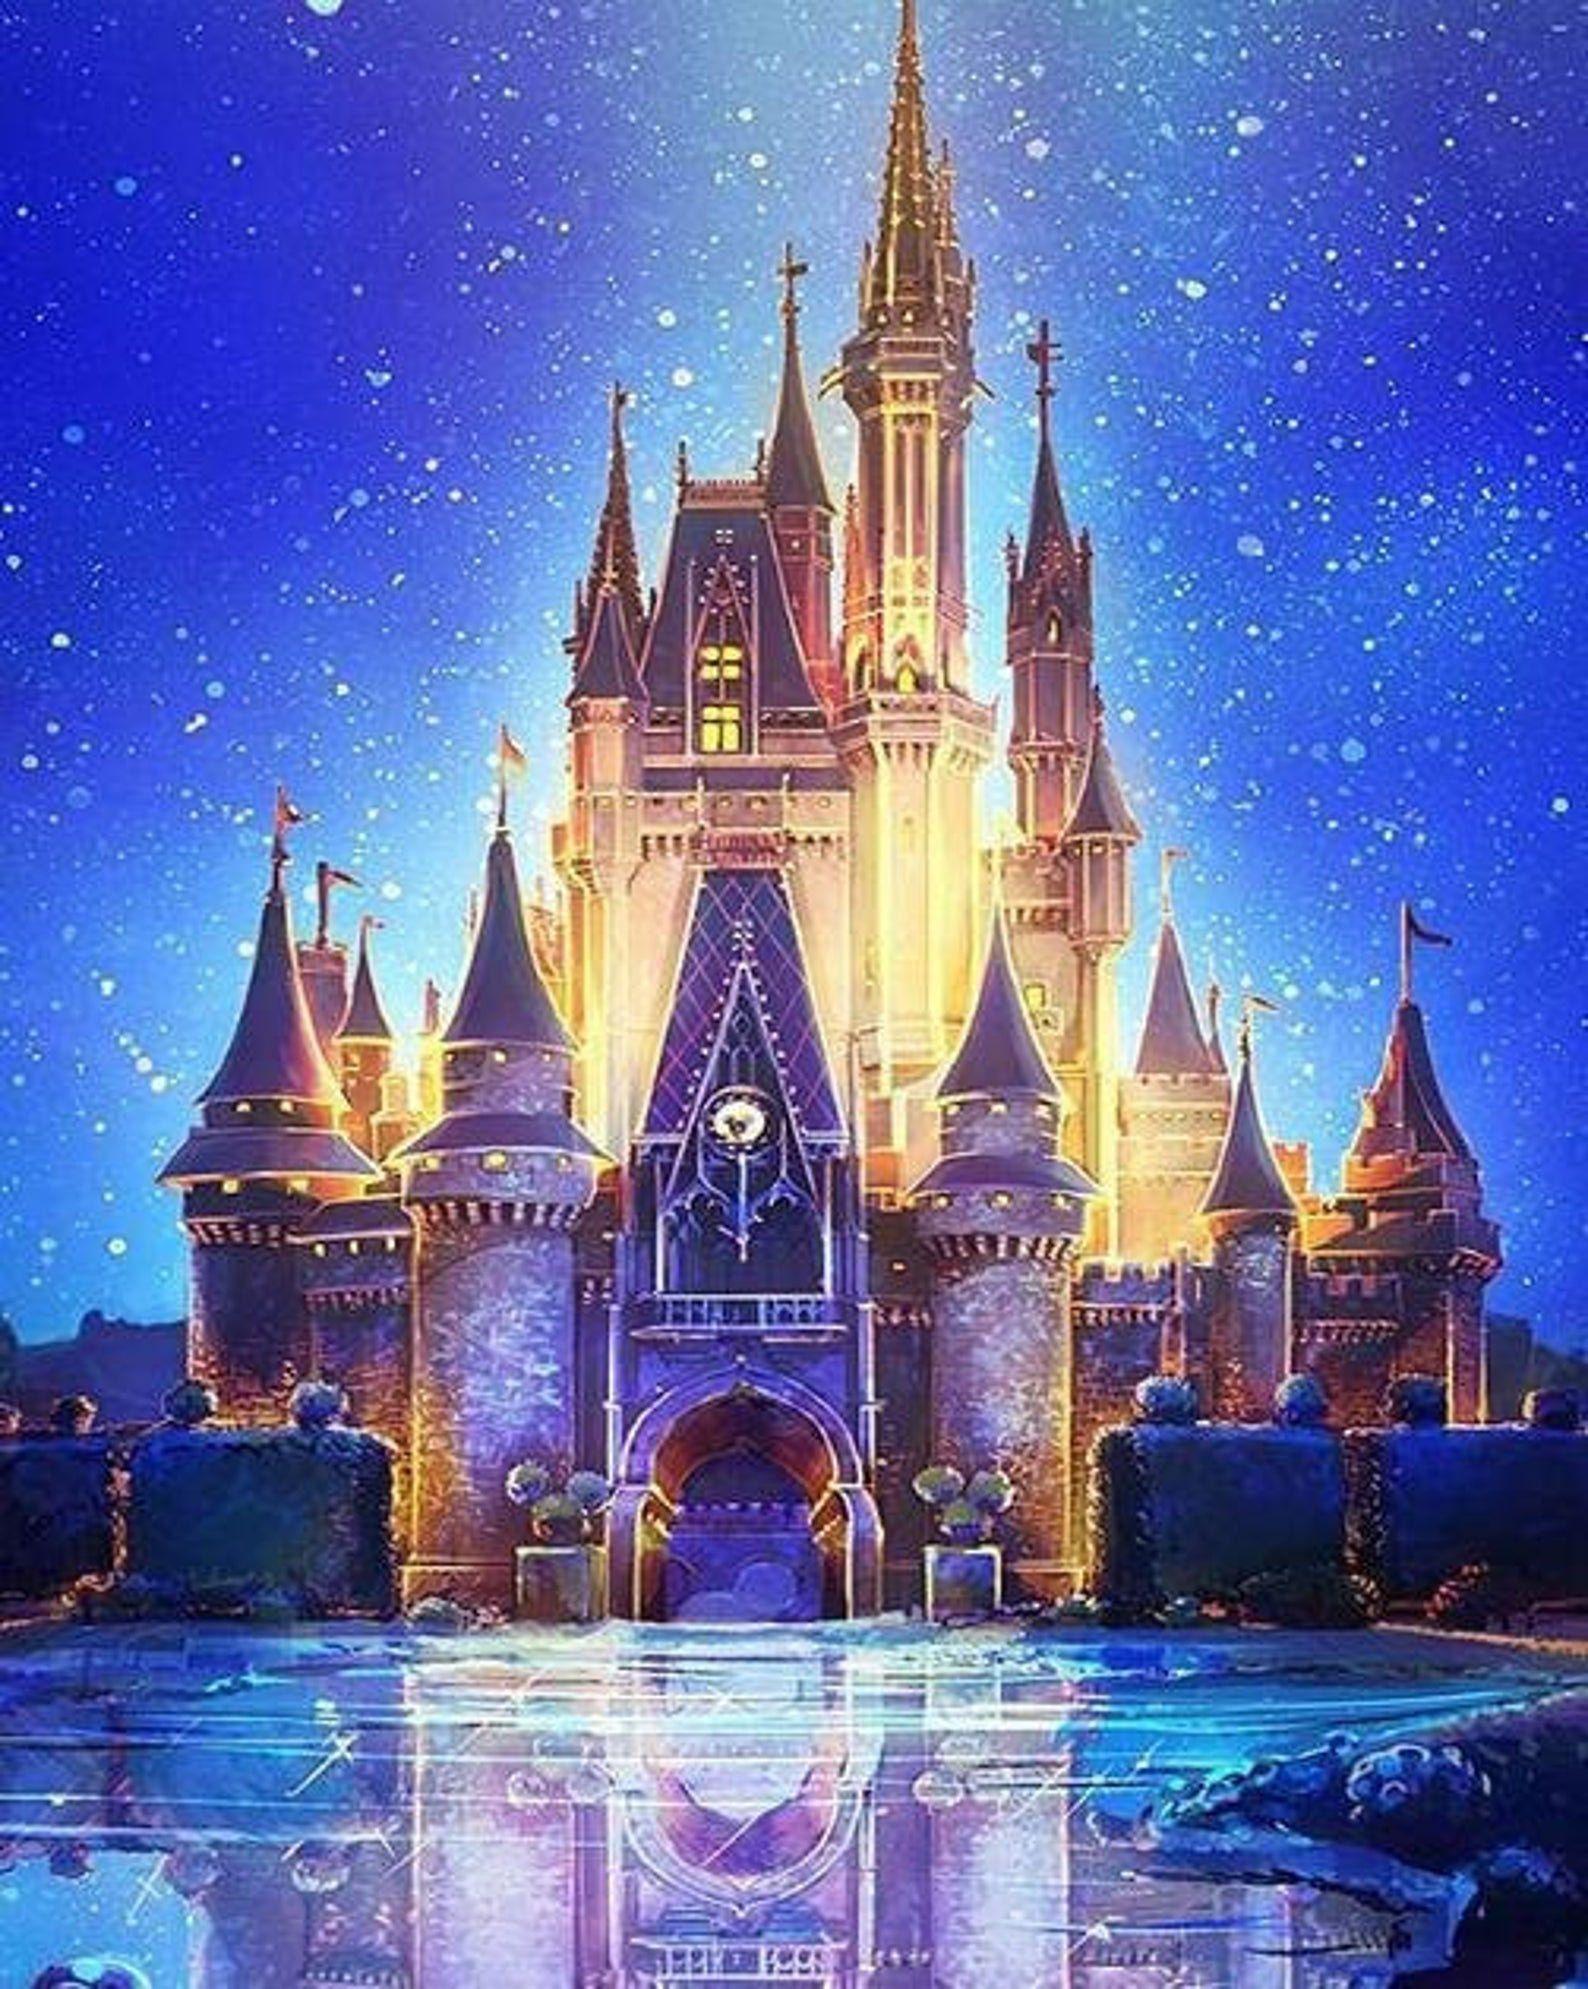 Disney Scenery 5D DIY Diamond Painting Kit House Full Drill Stick To Paint Home Decor Cross-stitch Mosaic Art Painting Christmas Gifts